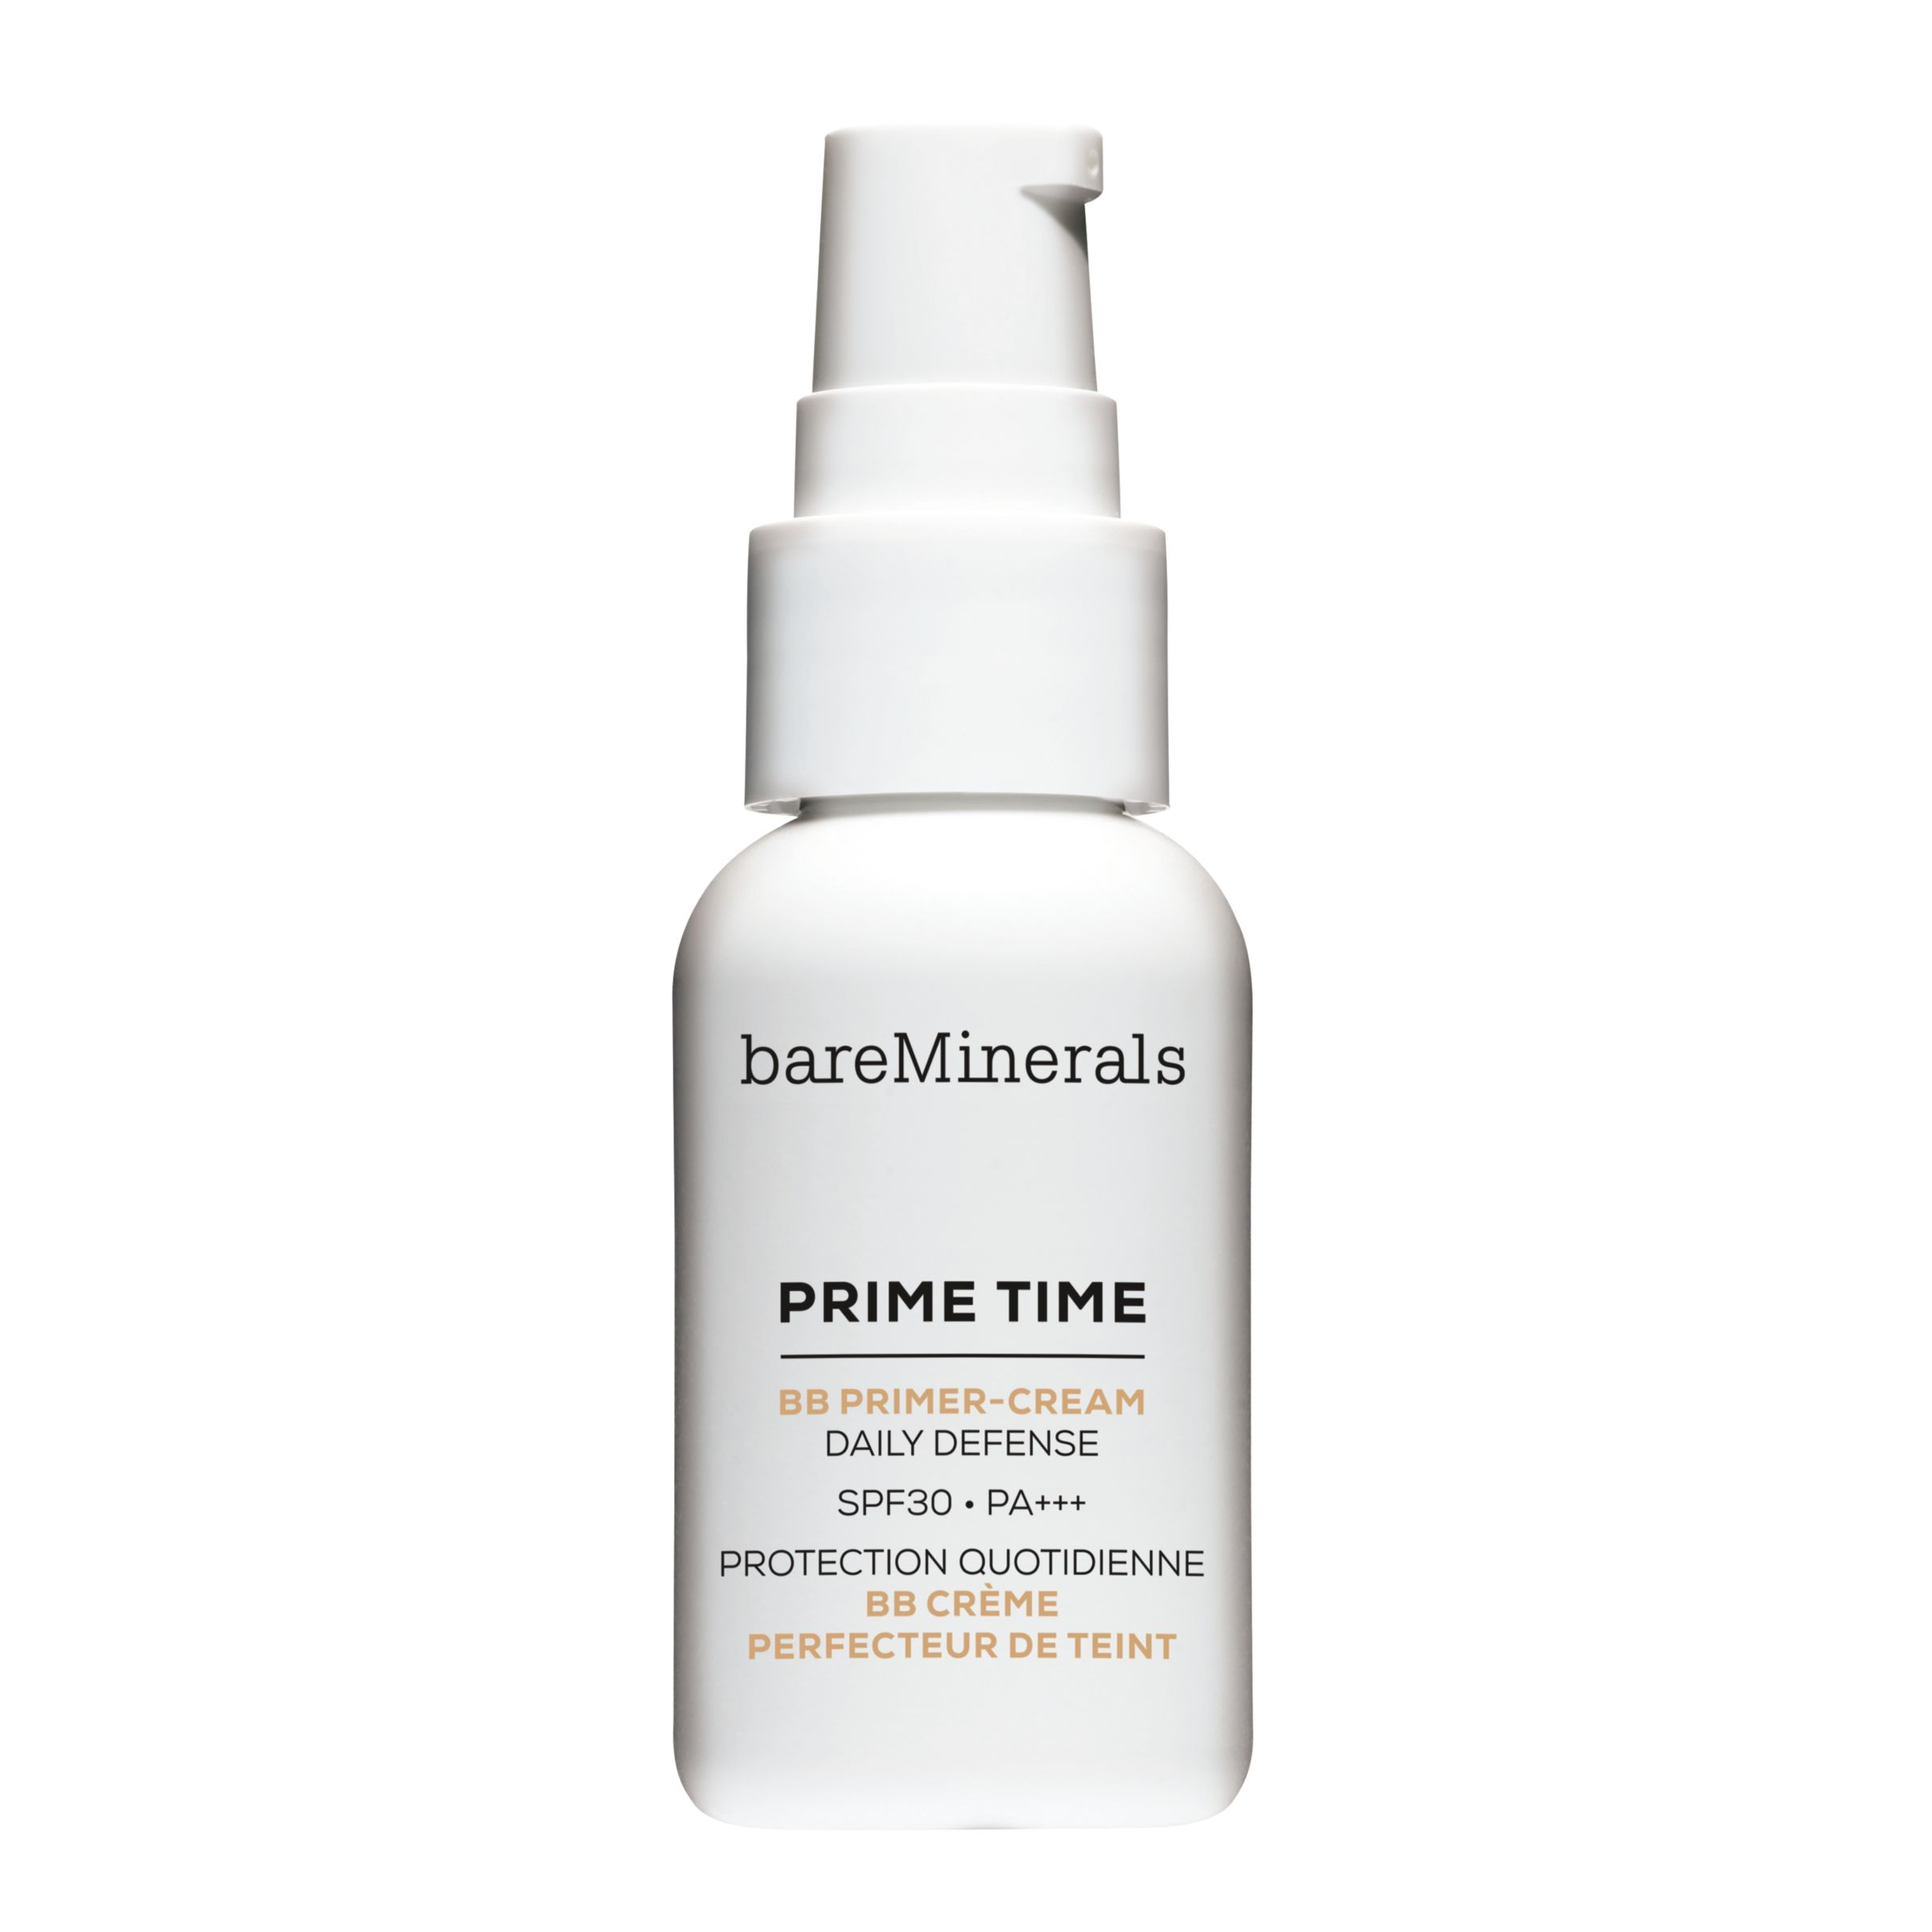 bareMinerals bareMinerals Prime Time™ BB Primer-Cream Daily Defense SPF 30